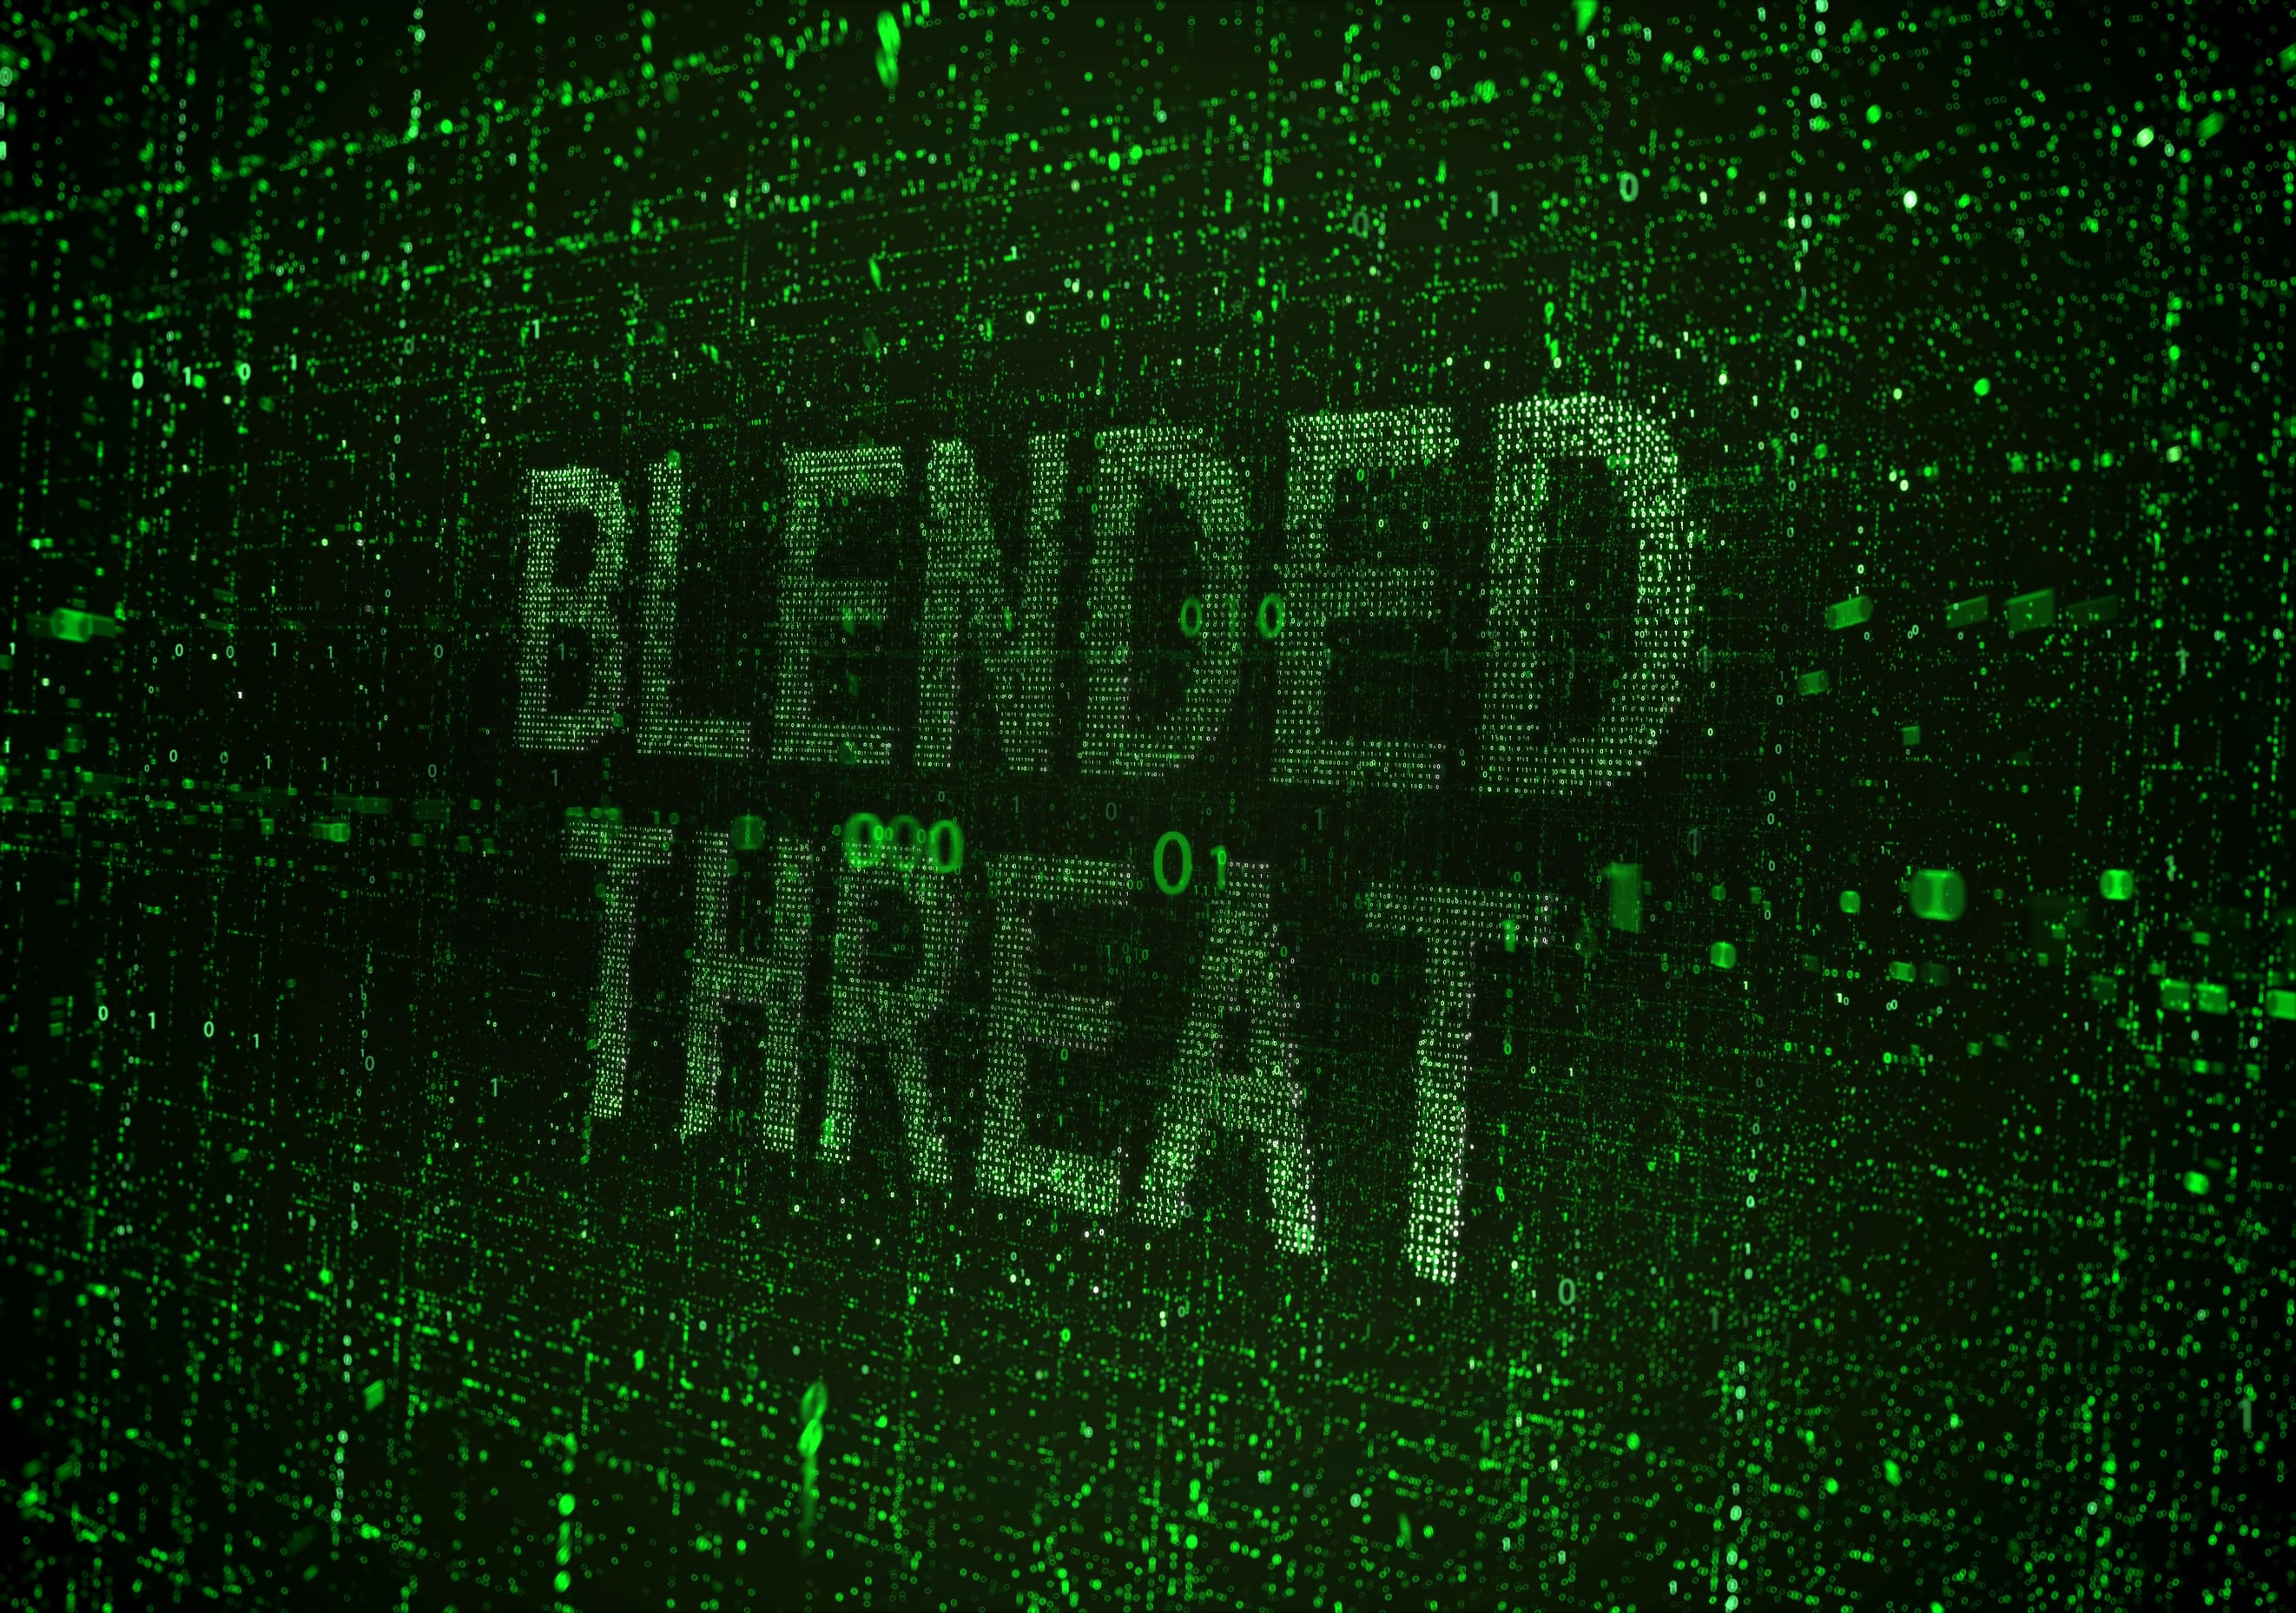 Watchguard releases Q4 2016 Threat Report